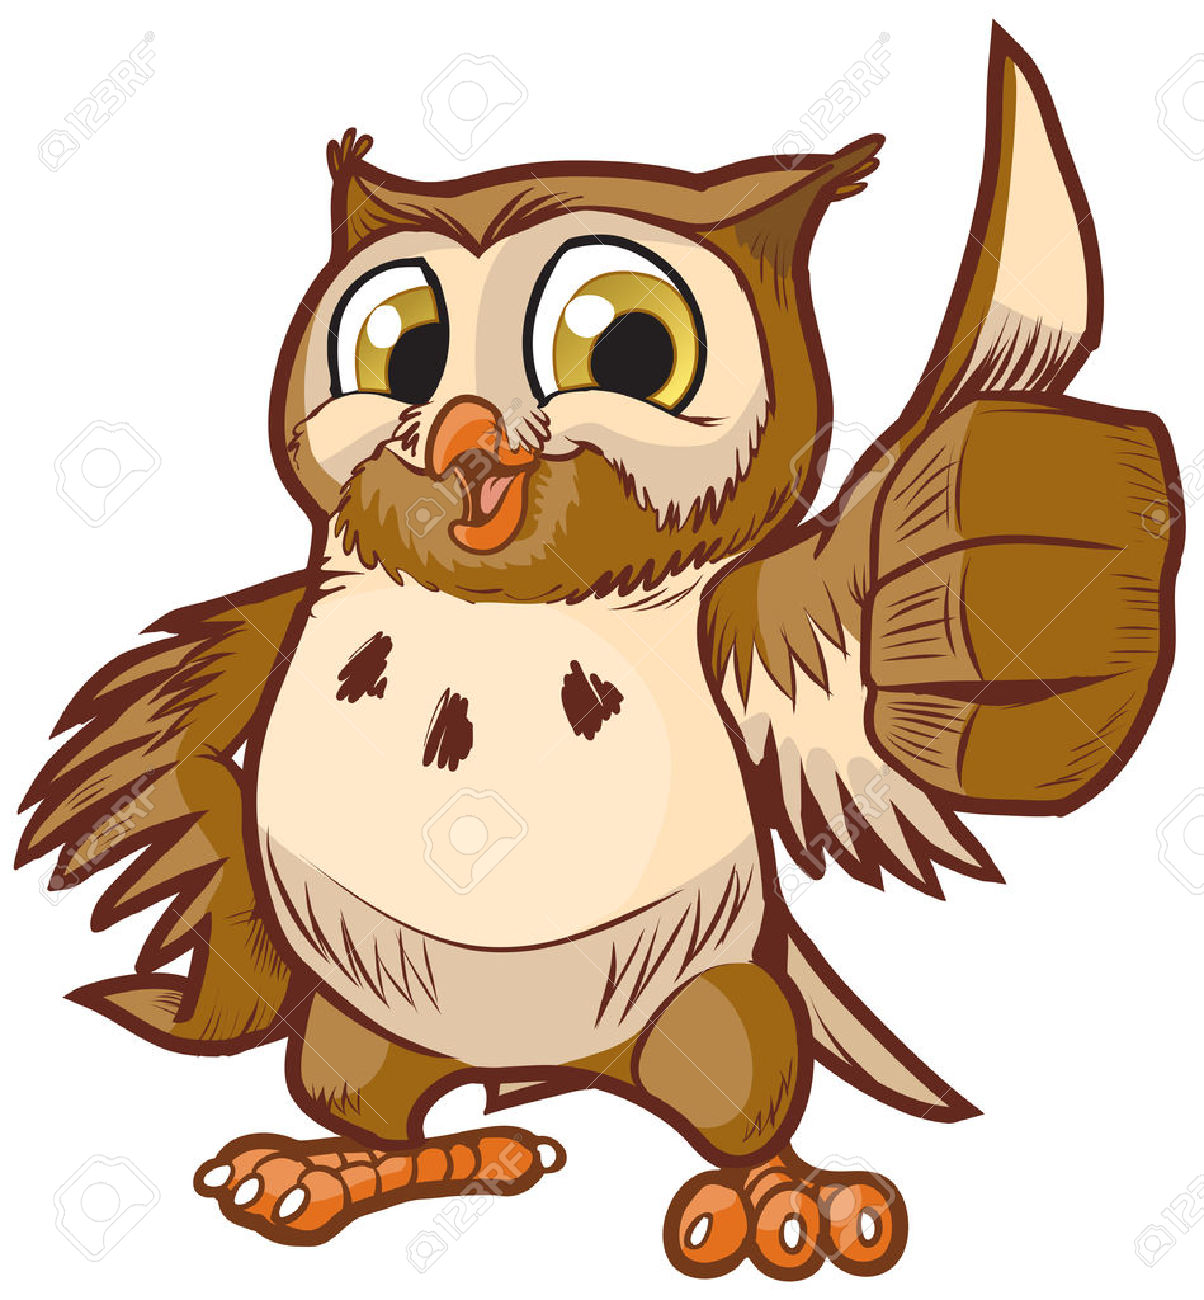 1204x1300 Vector Cartoon Clip Art Illustration Of A Cute And Happy Owl